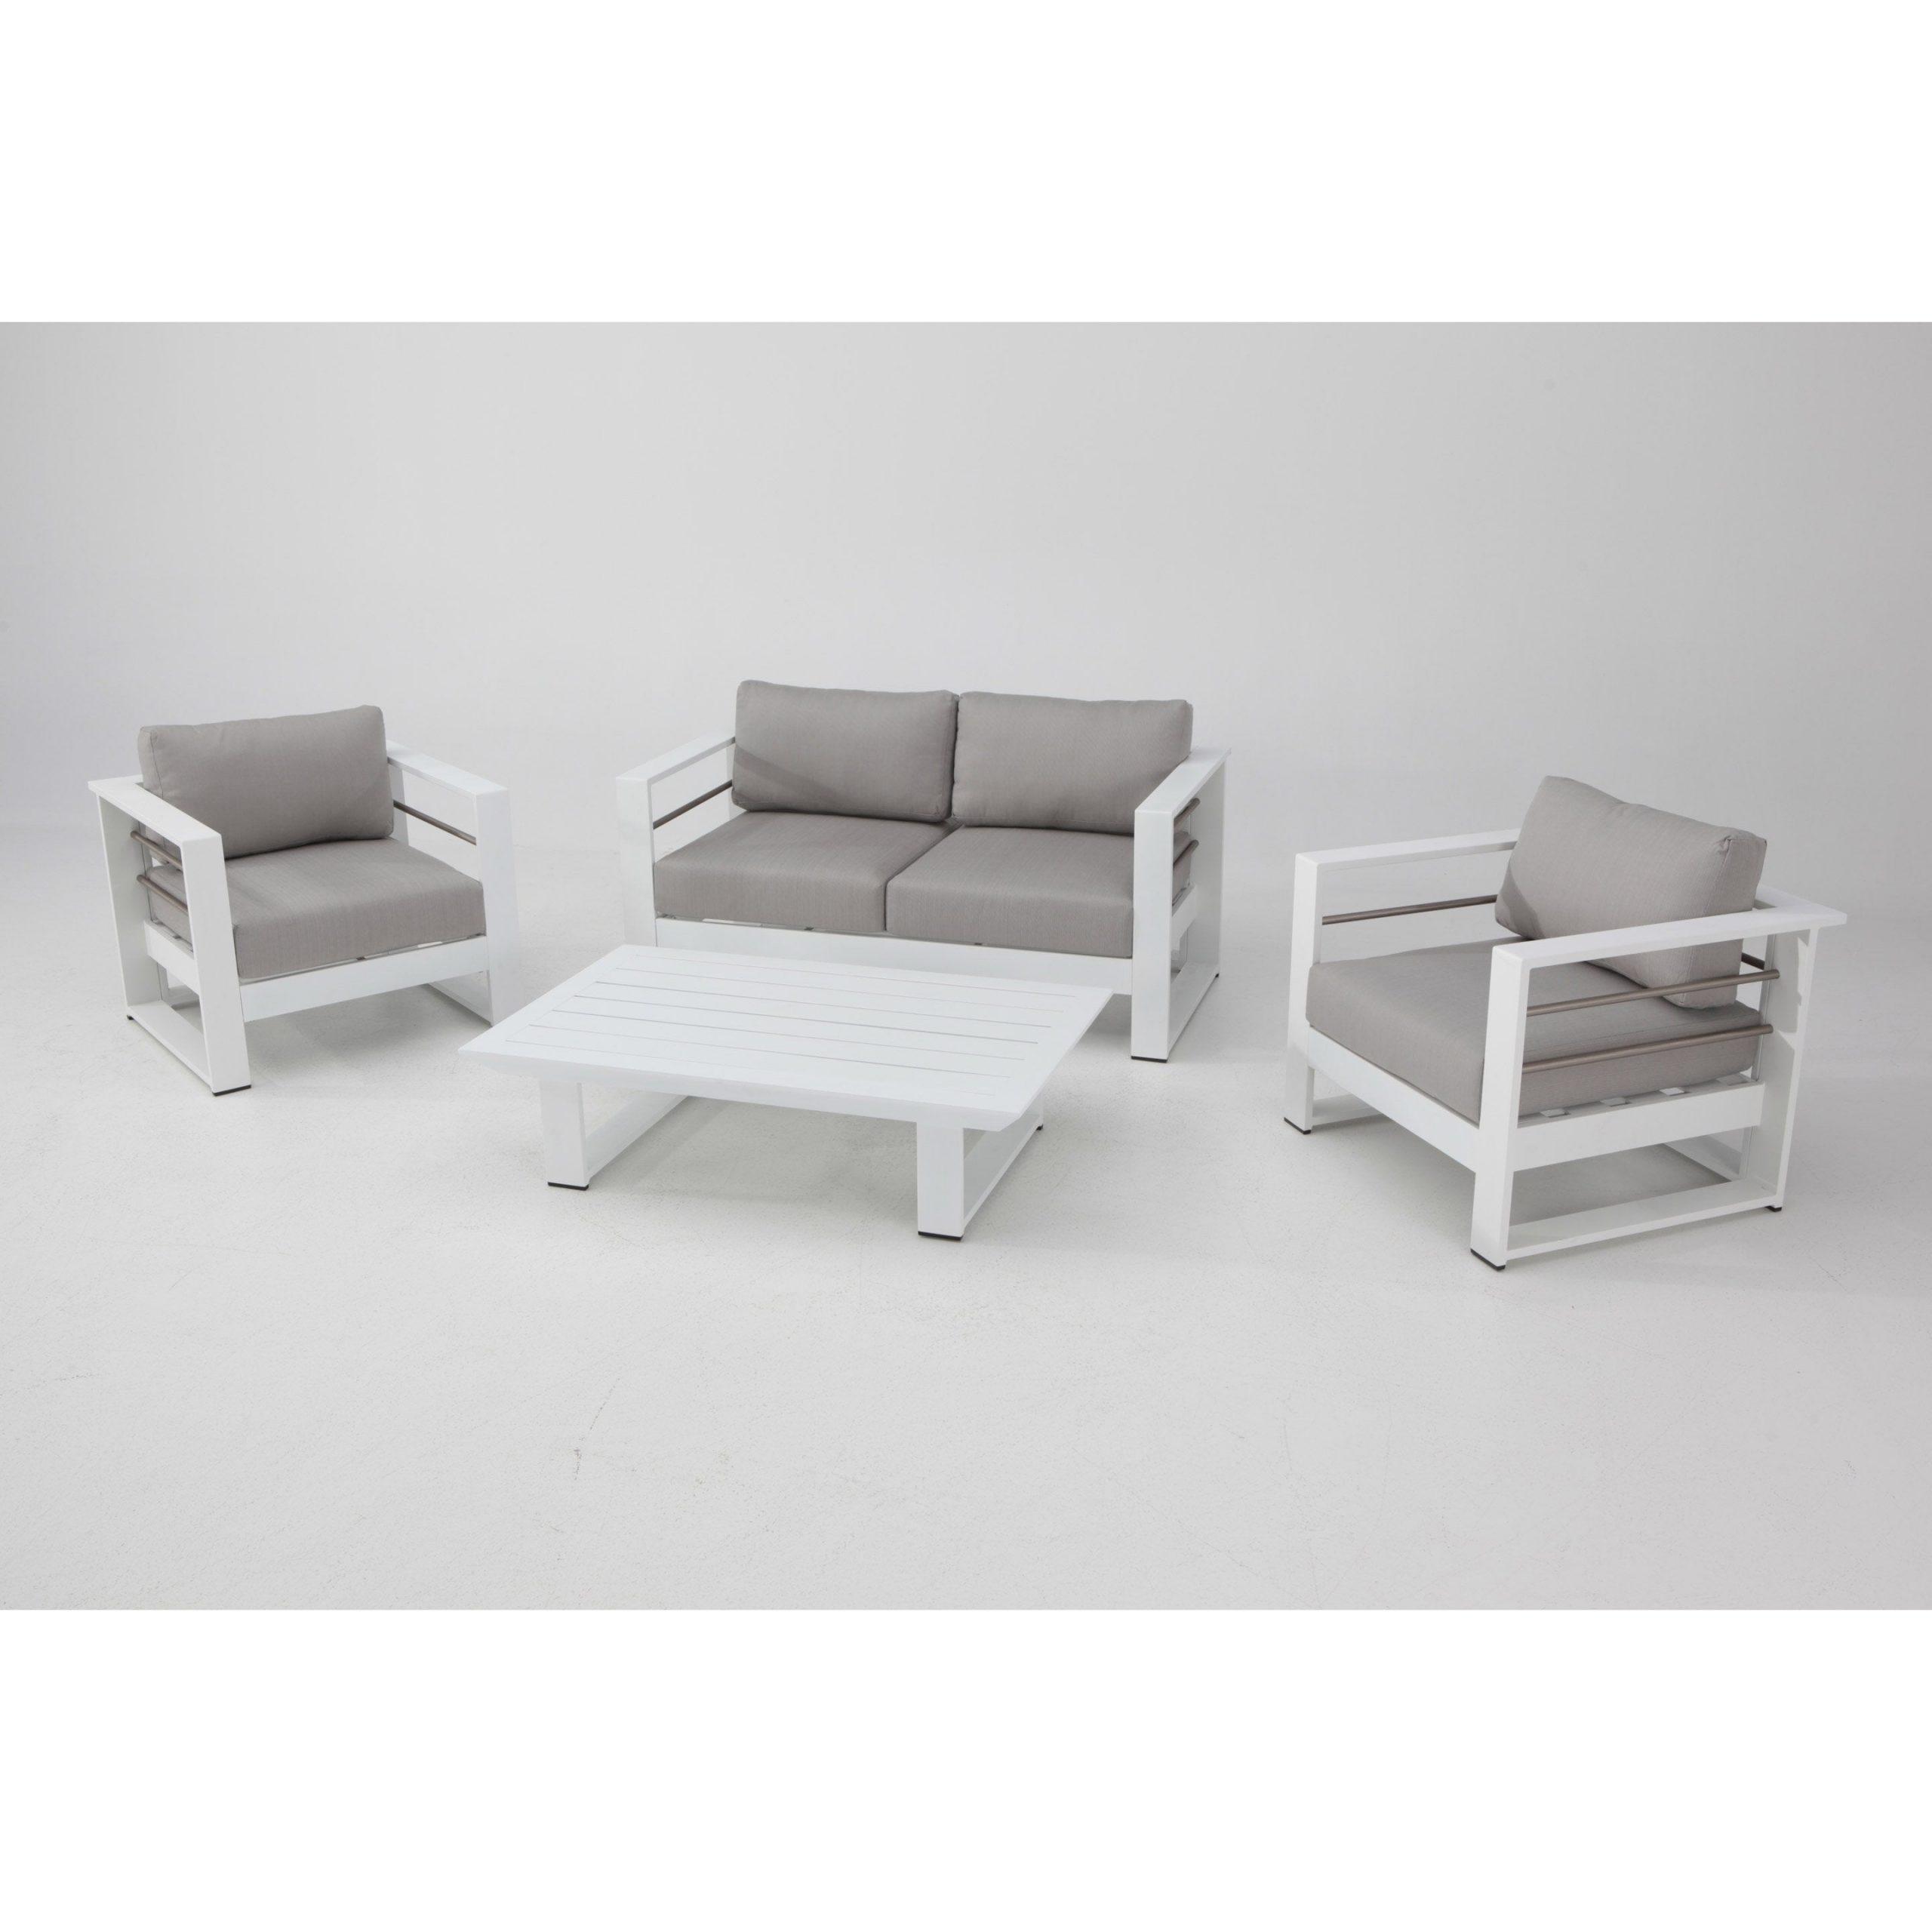 Salon Bas De Jardin Kyra Aluminium Blanc, 4 Personnes ... dedans Salon De Jardin Bas Aluminium